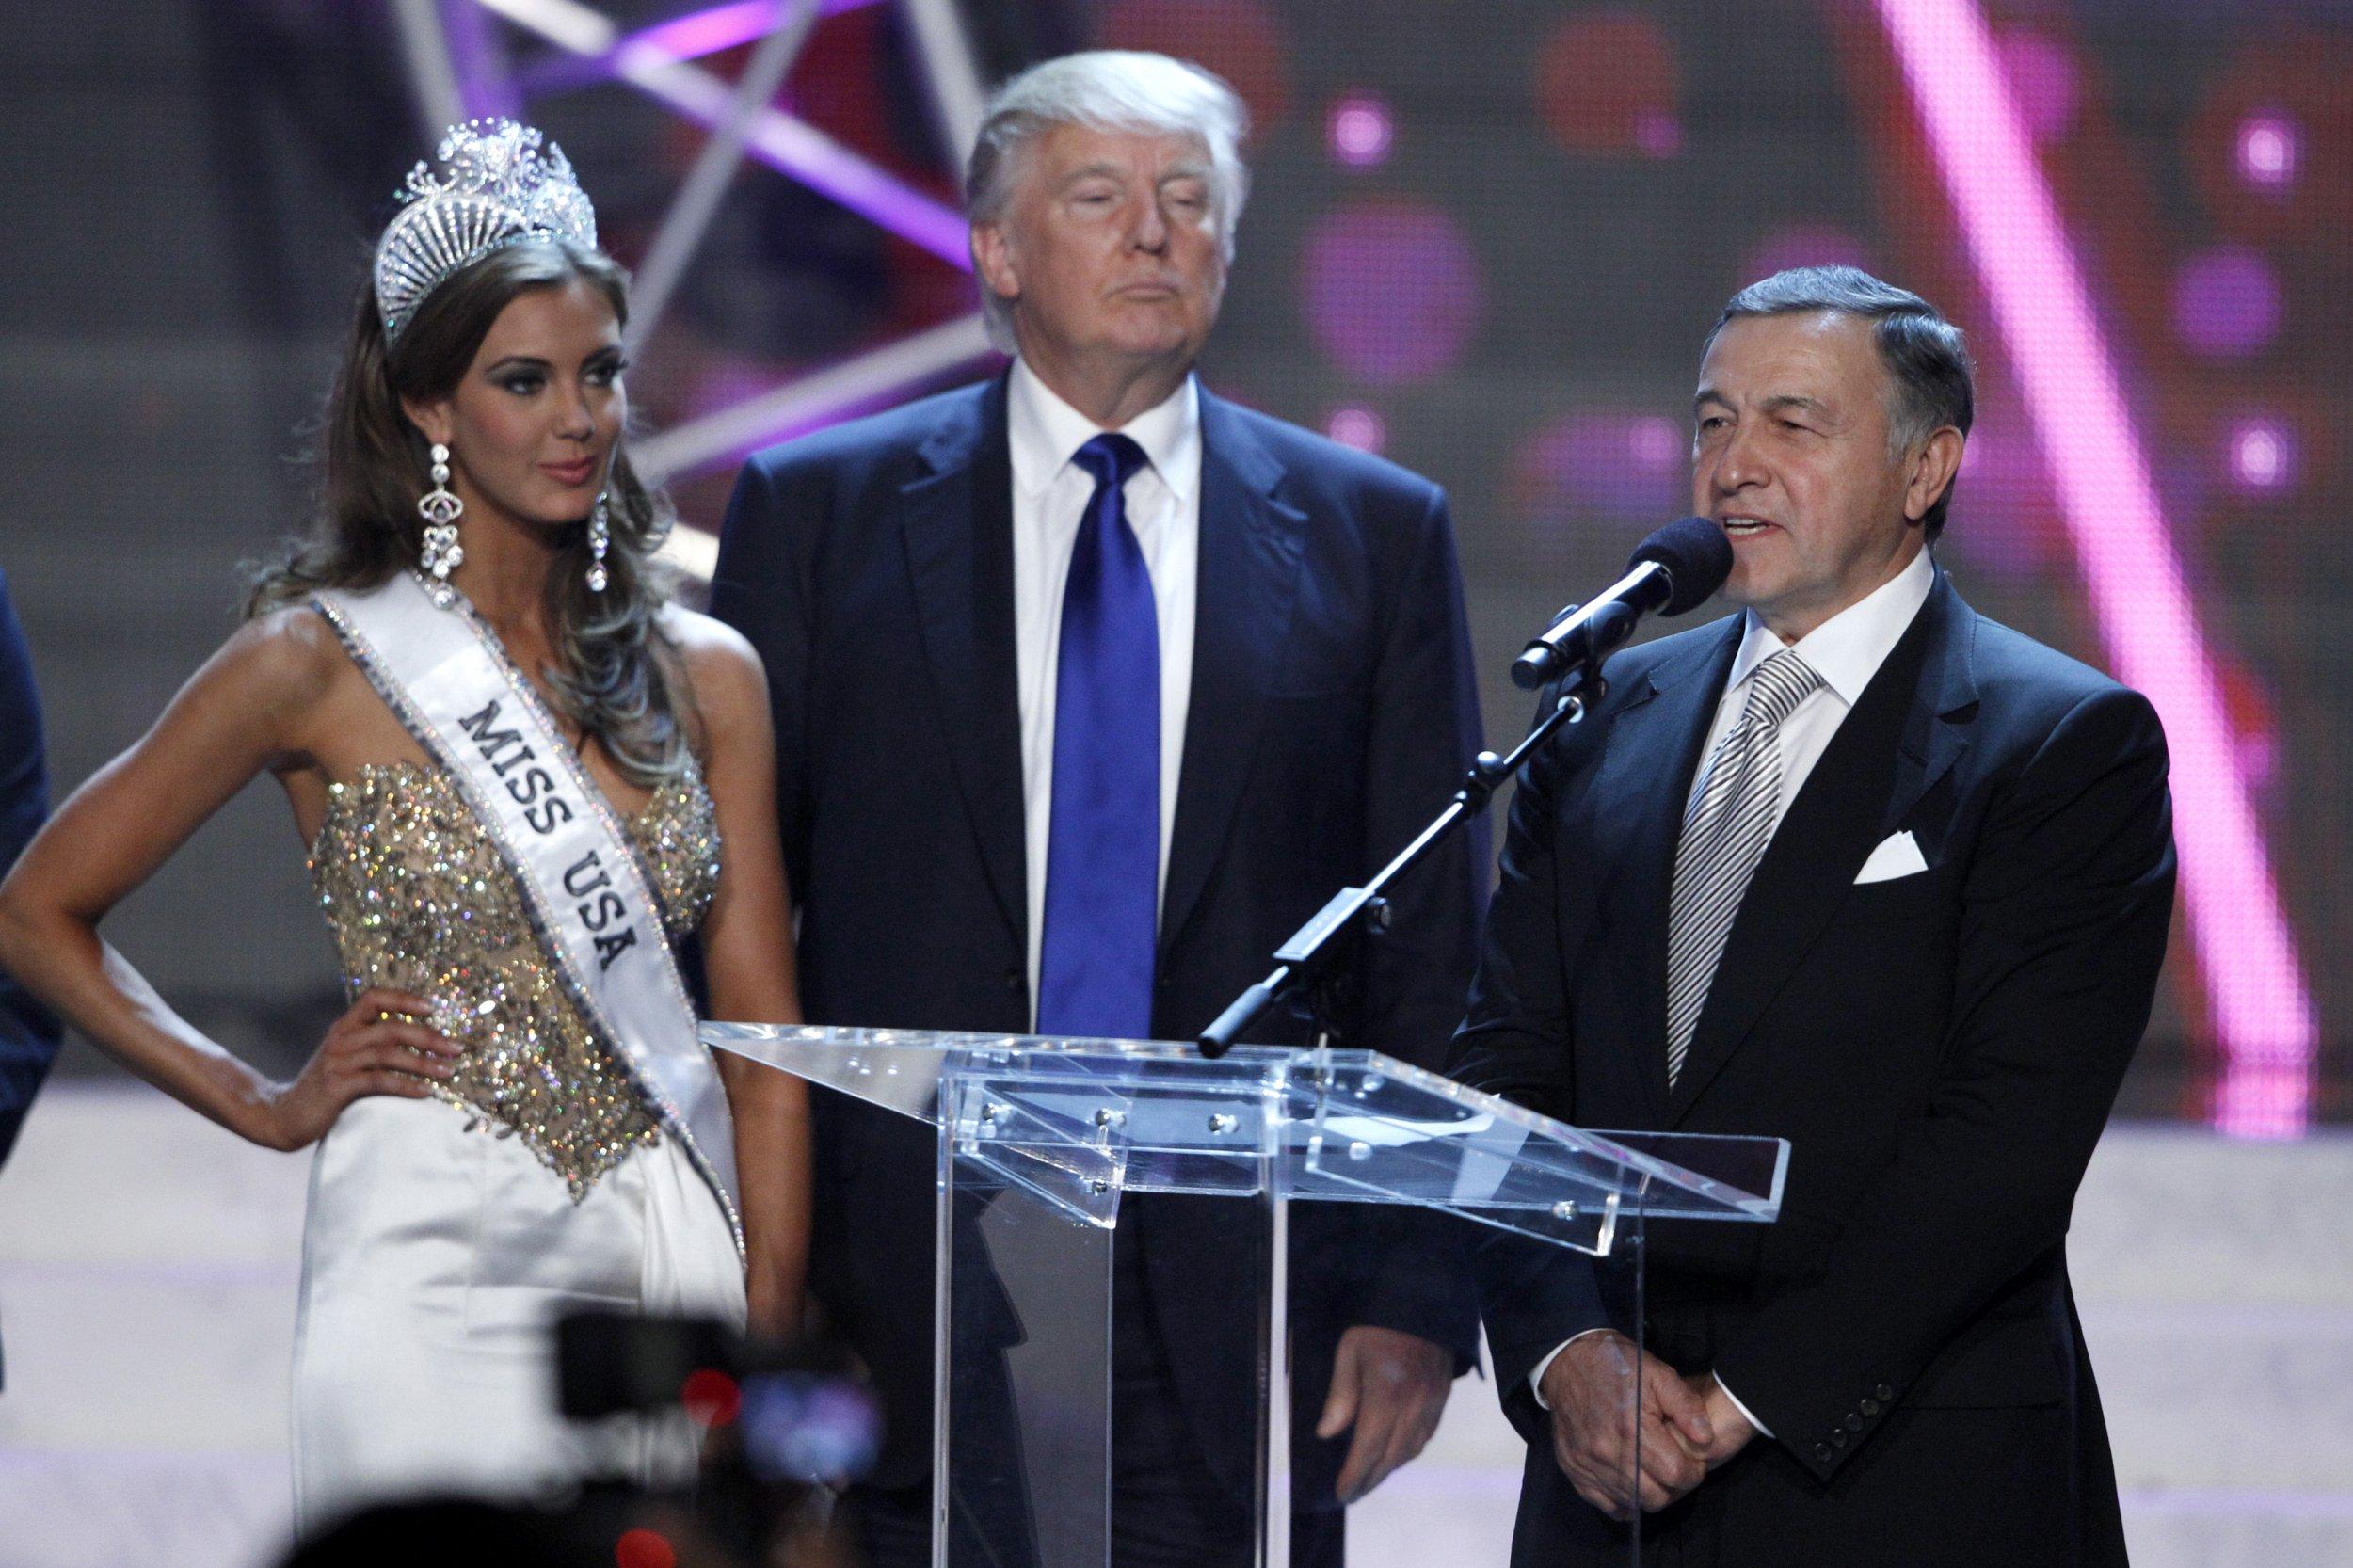 Trump and Agalarov